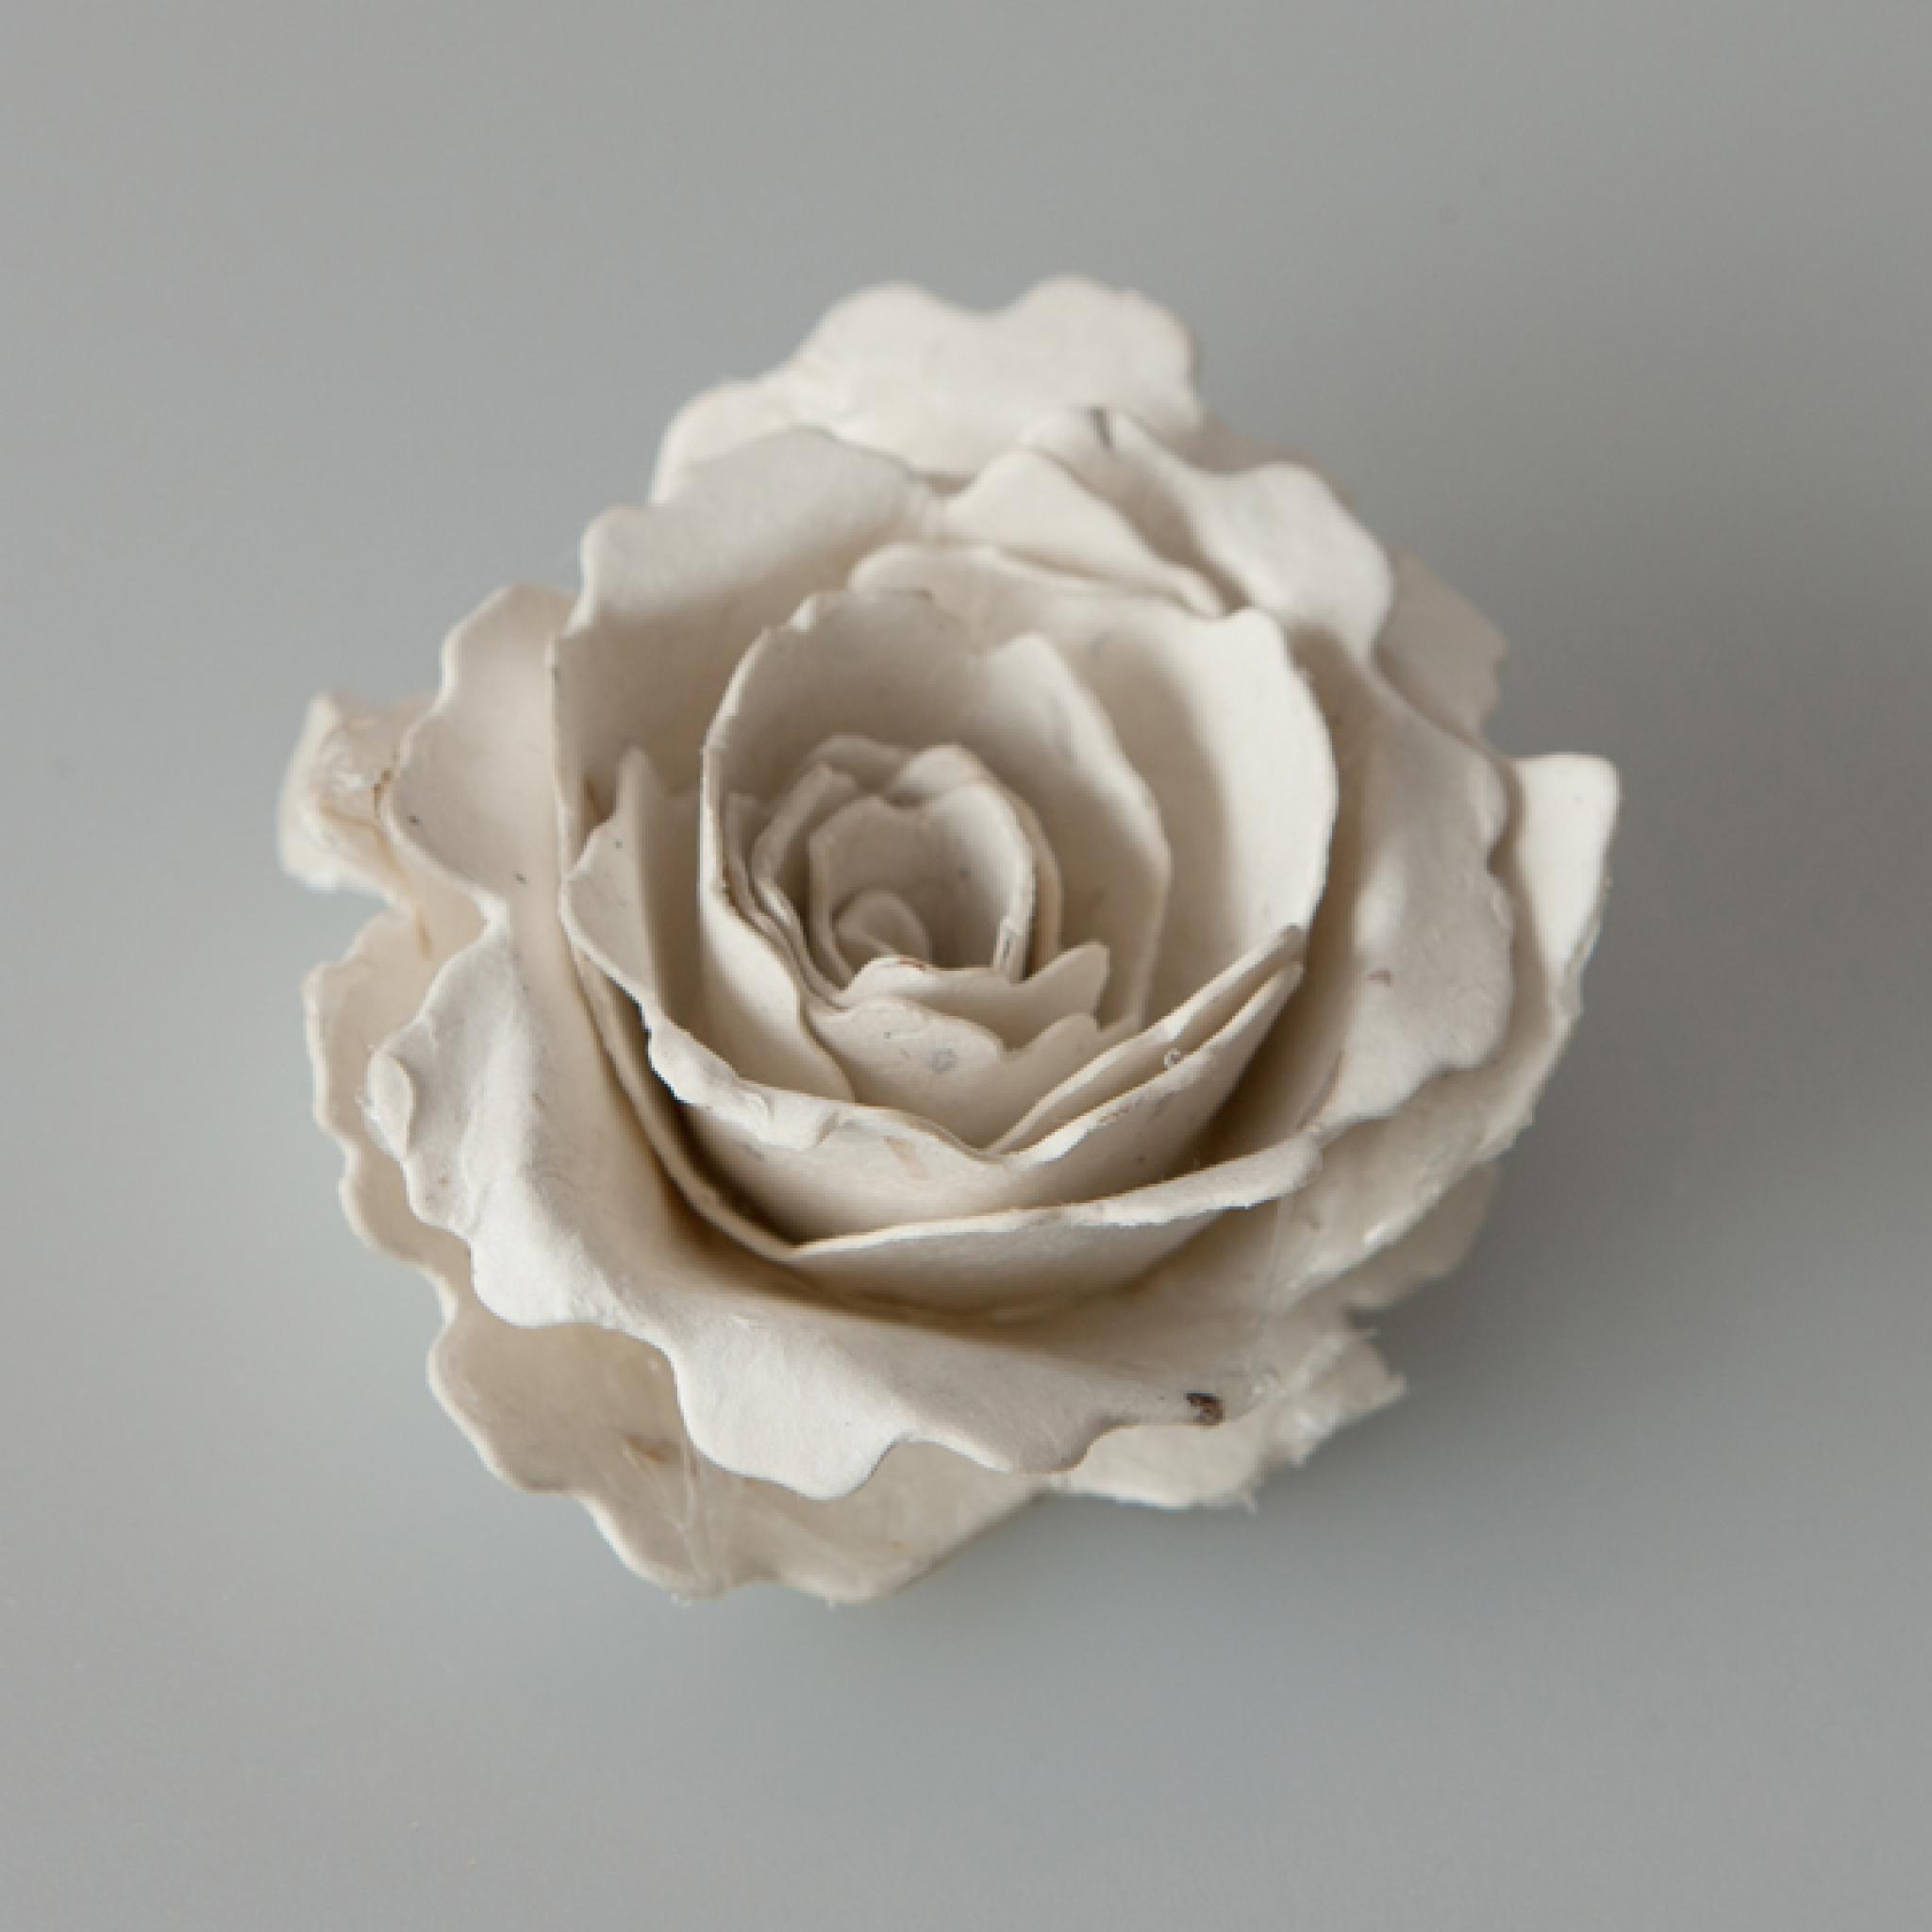 Handmade Seeded Paper Flower Corsage Kit Pack Of 5 Flowers